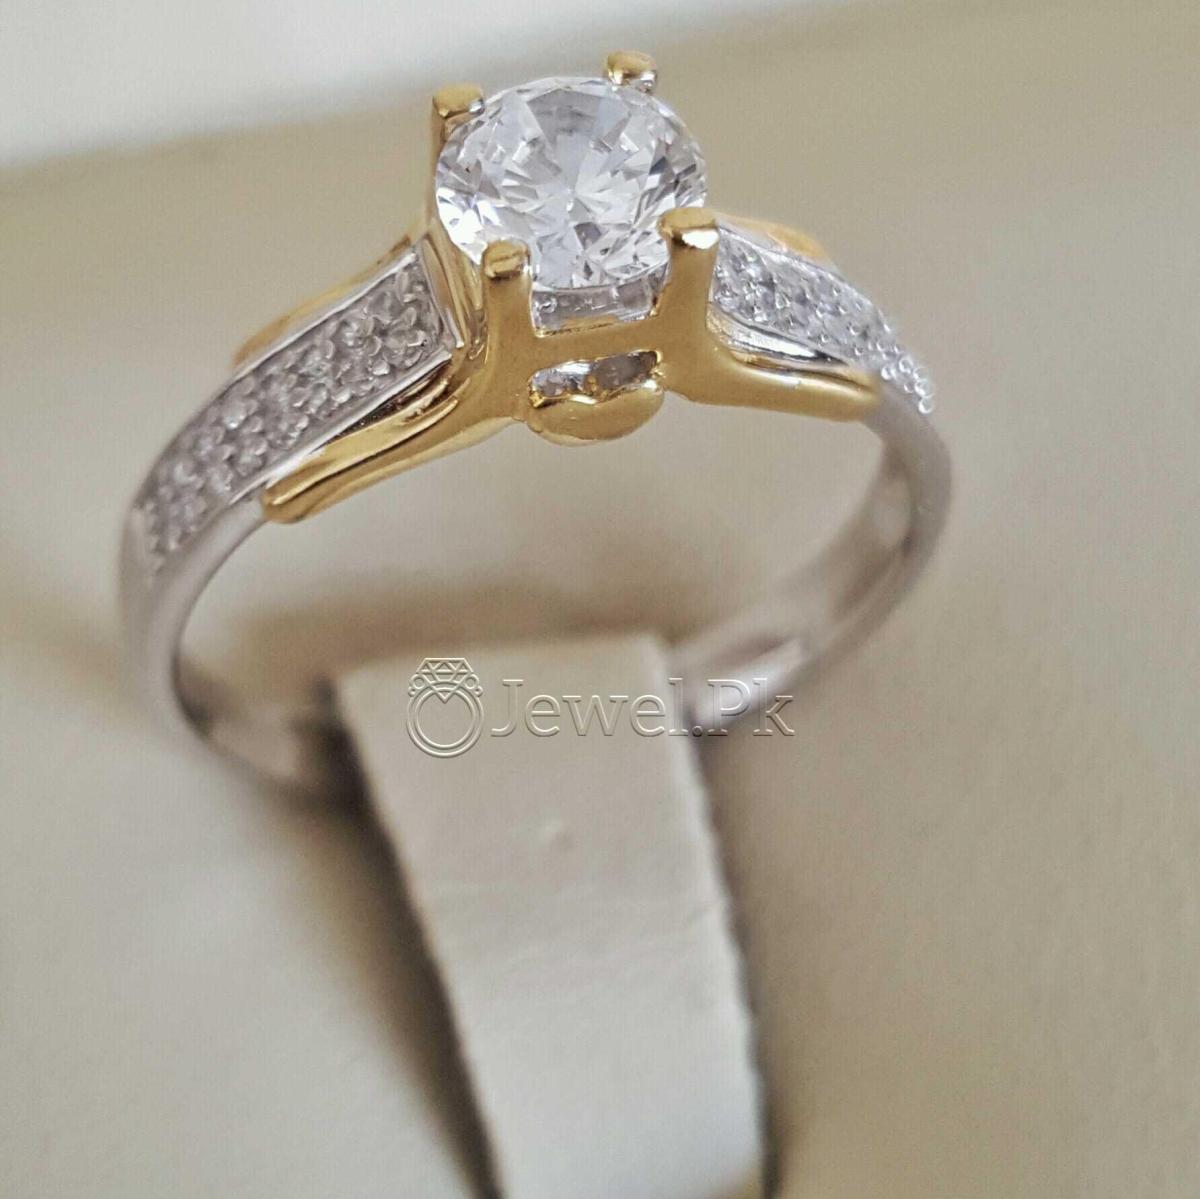 925 Silver Luxury Rings for Ladies Women Silver Rings Woman Handmade Rings 48 natural gemstones pakistan + 925 silver jewelry online